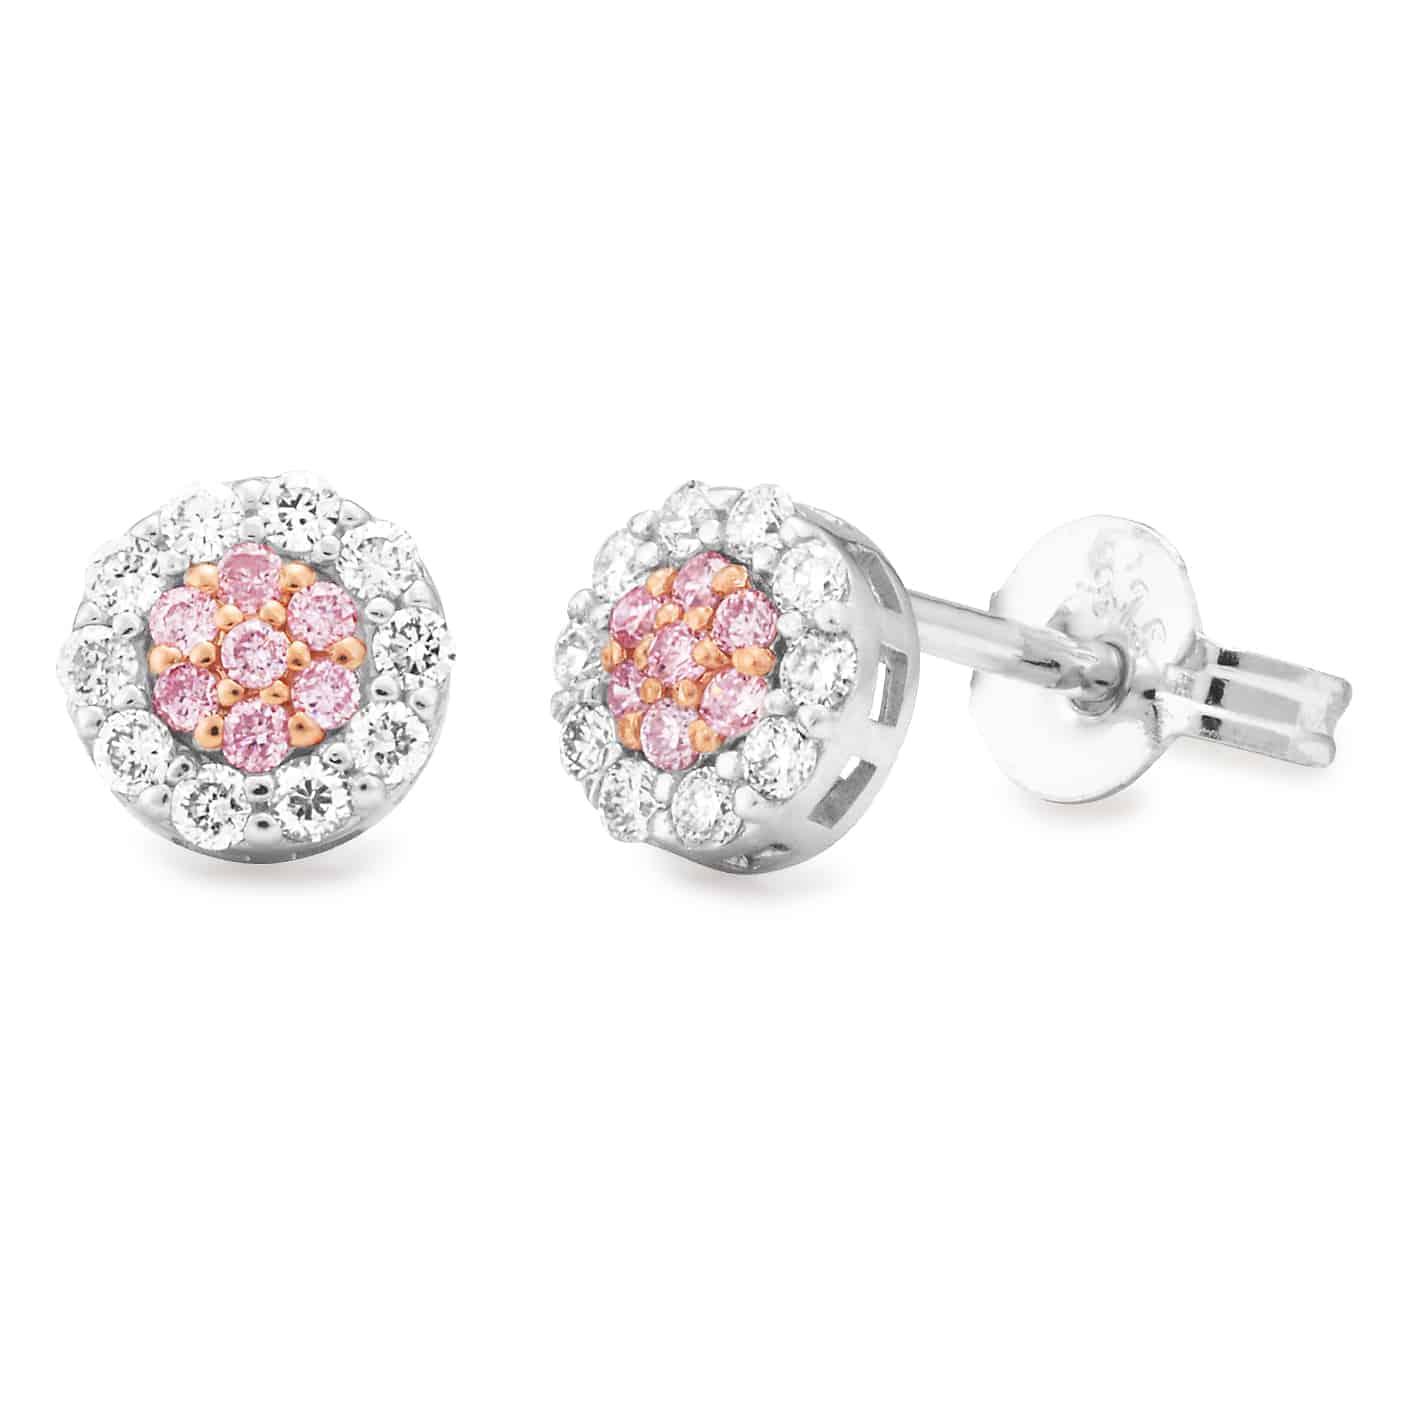 9ct White Gold Cluster Set Pink Argyle Diamond earrings_0